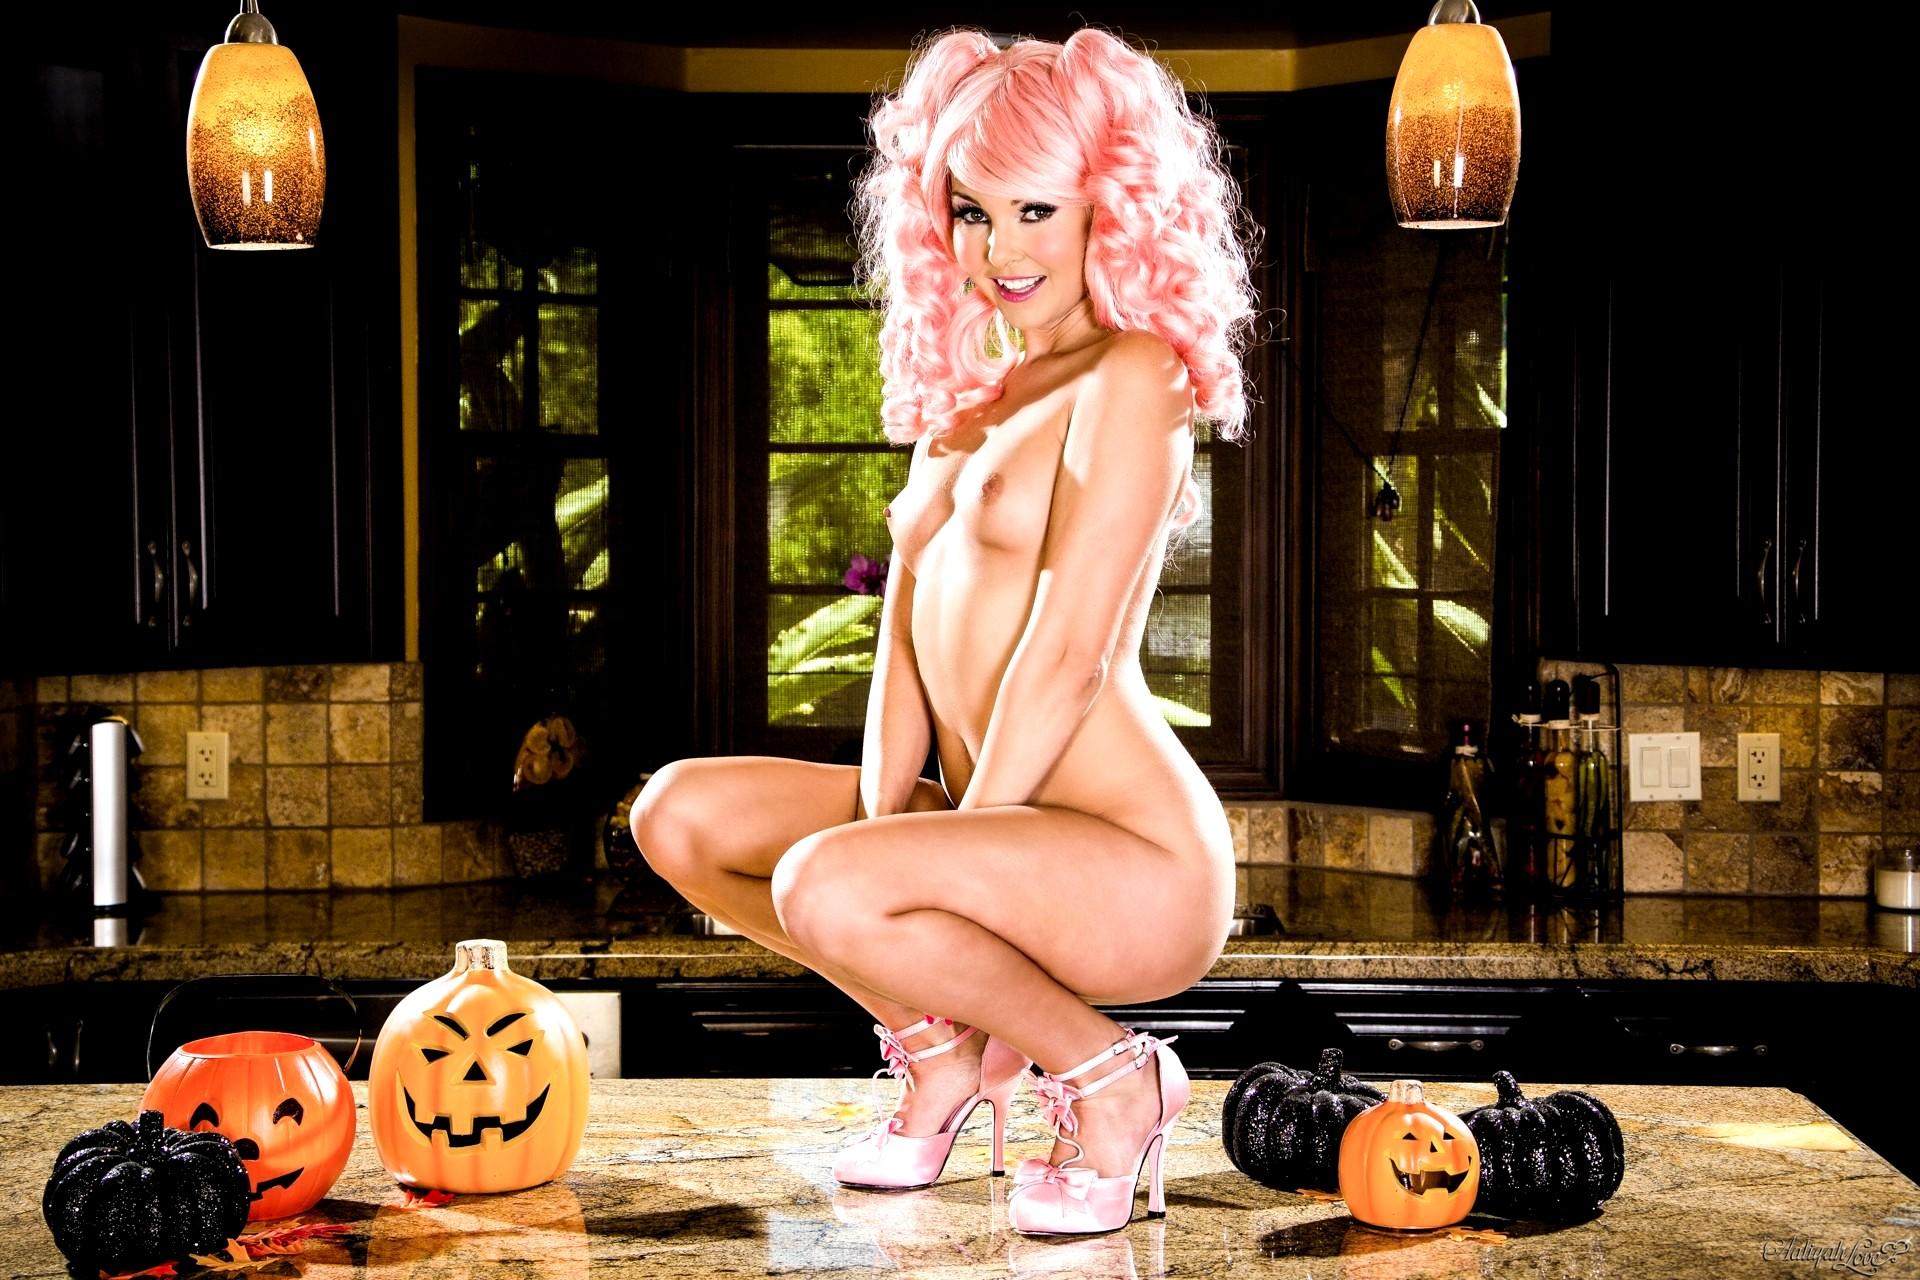 Naughty nude halloween pics